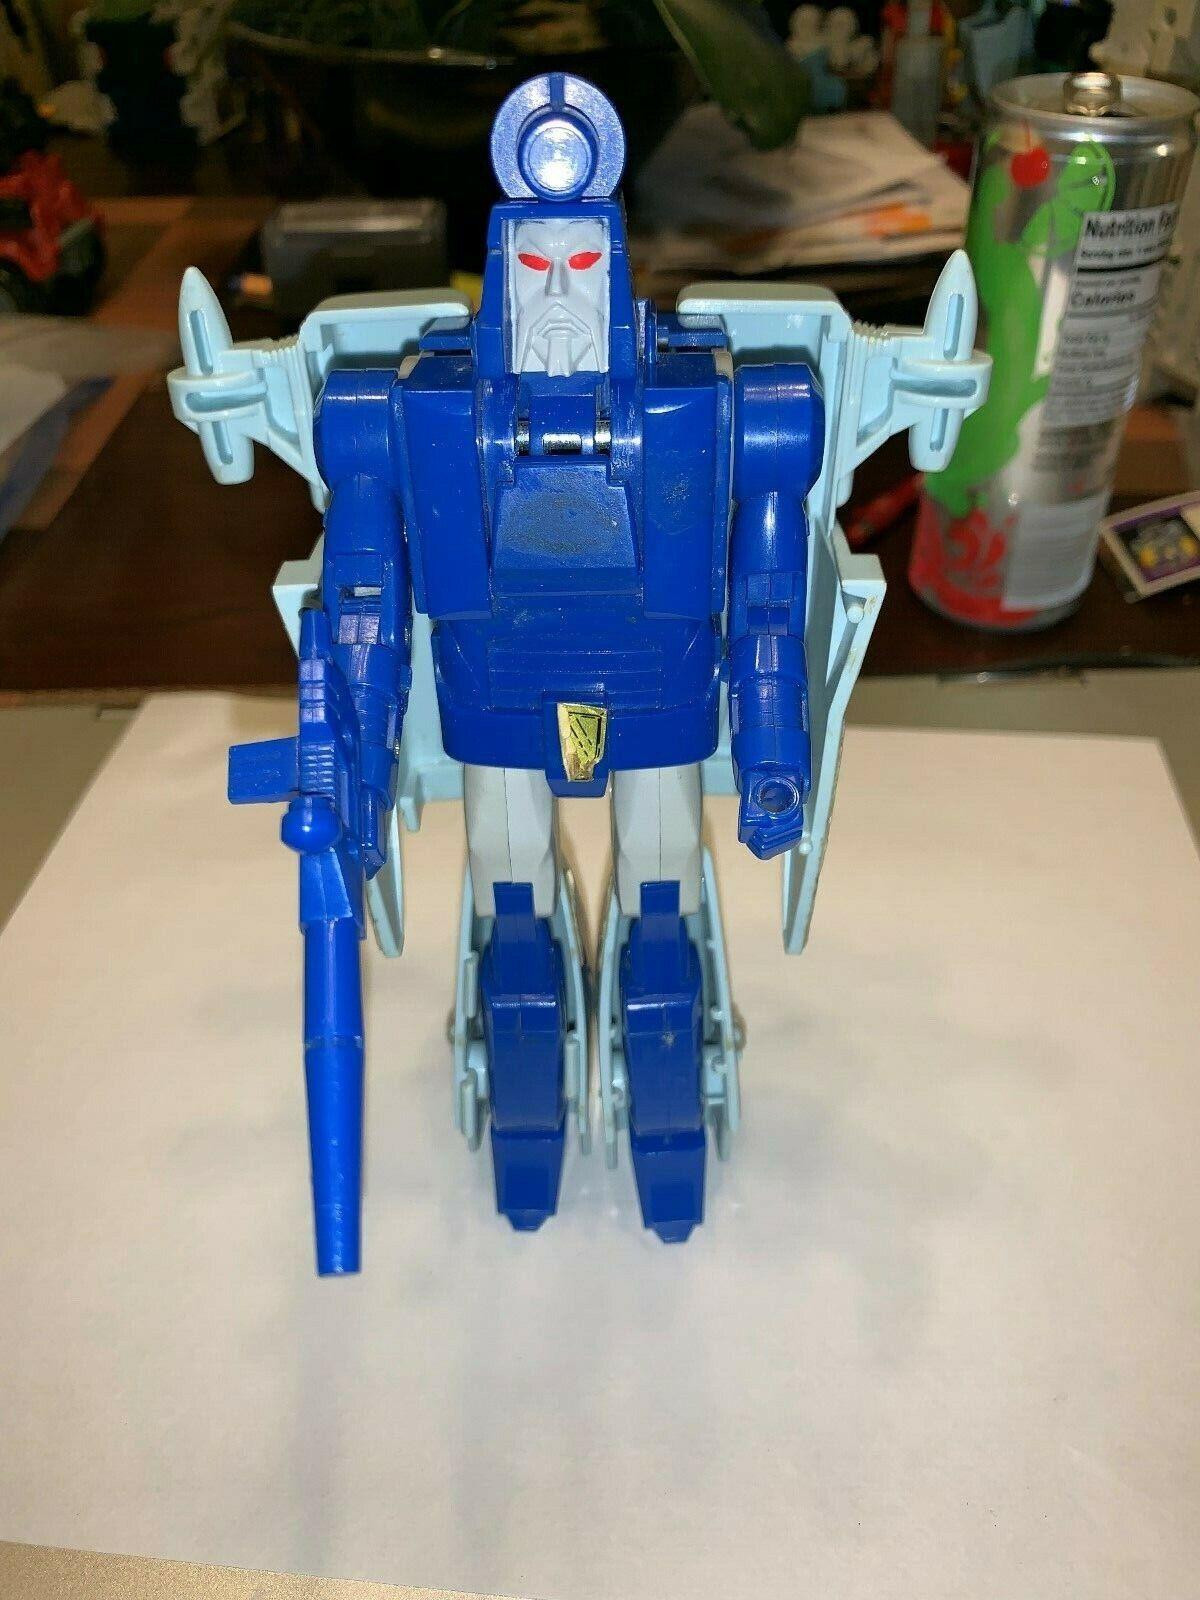 Scourge 100% Complete 1986 Vintage G1 Transformers Action Action Action Figure a02d26